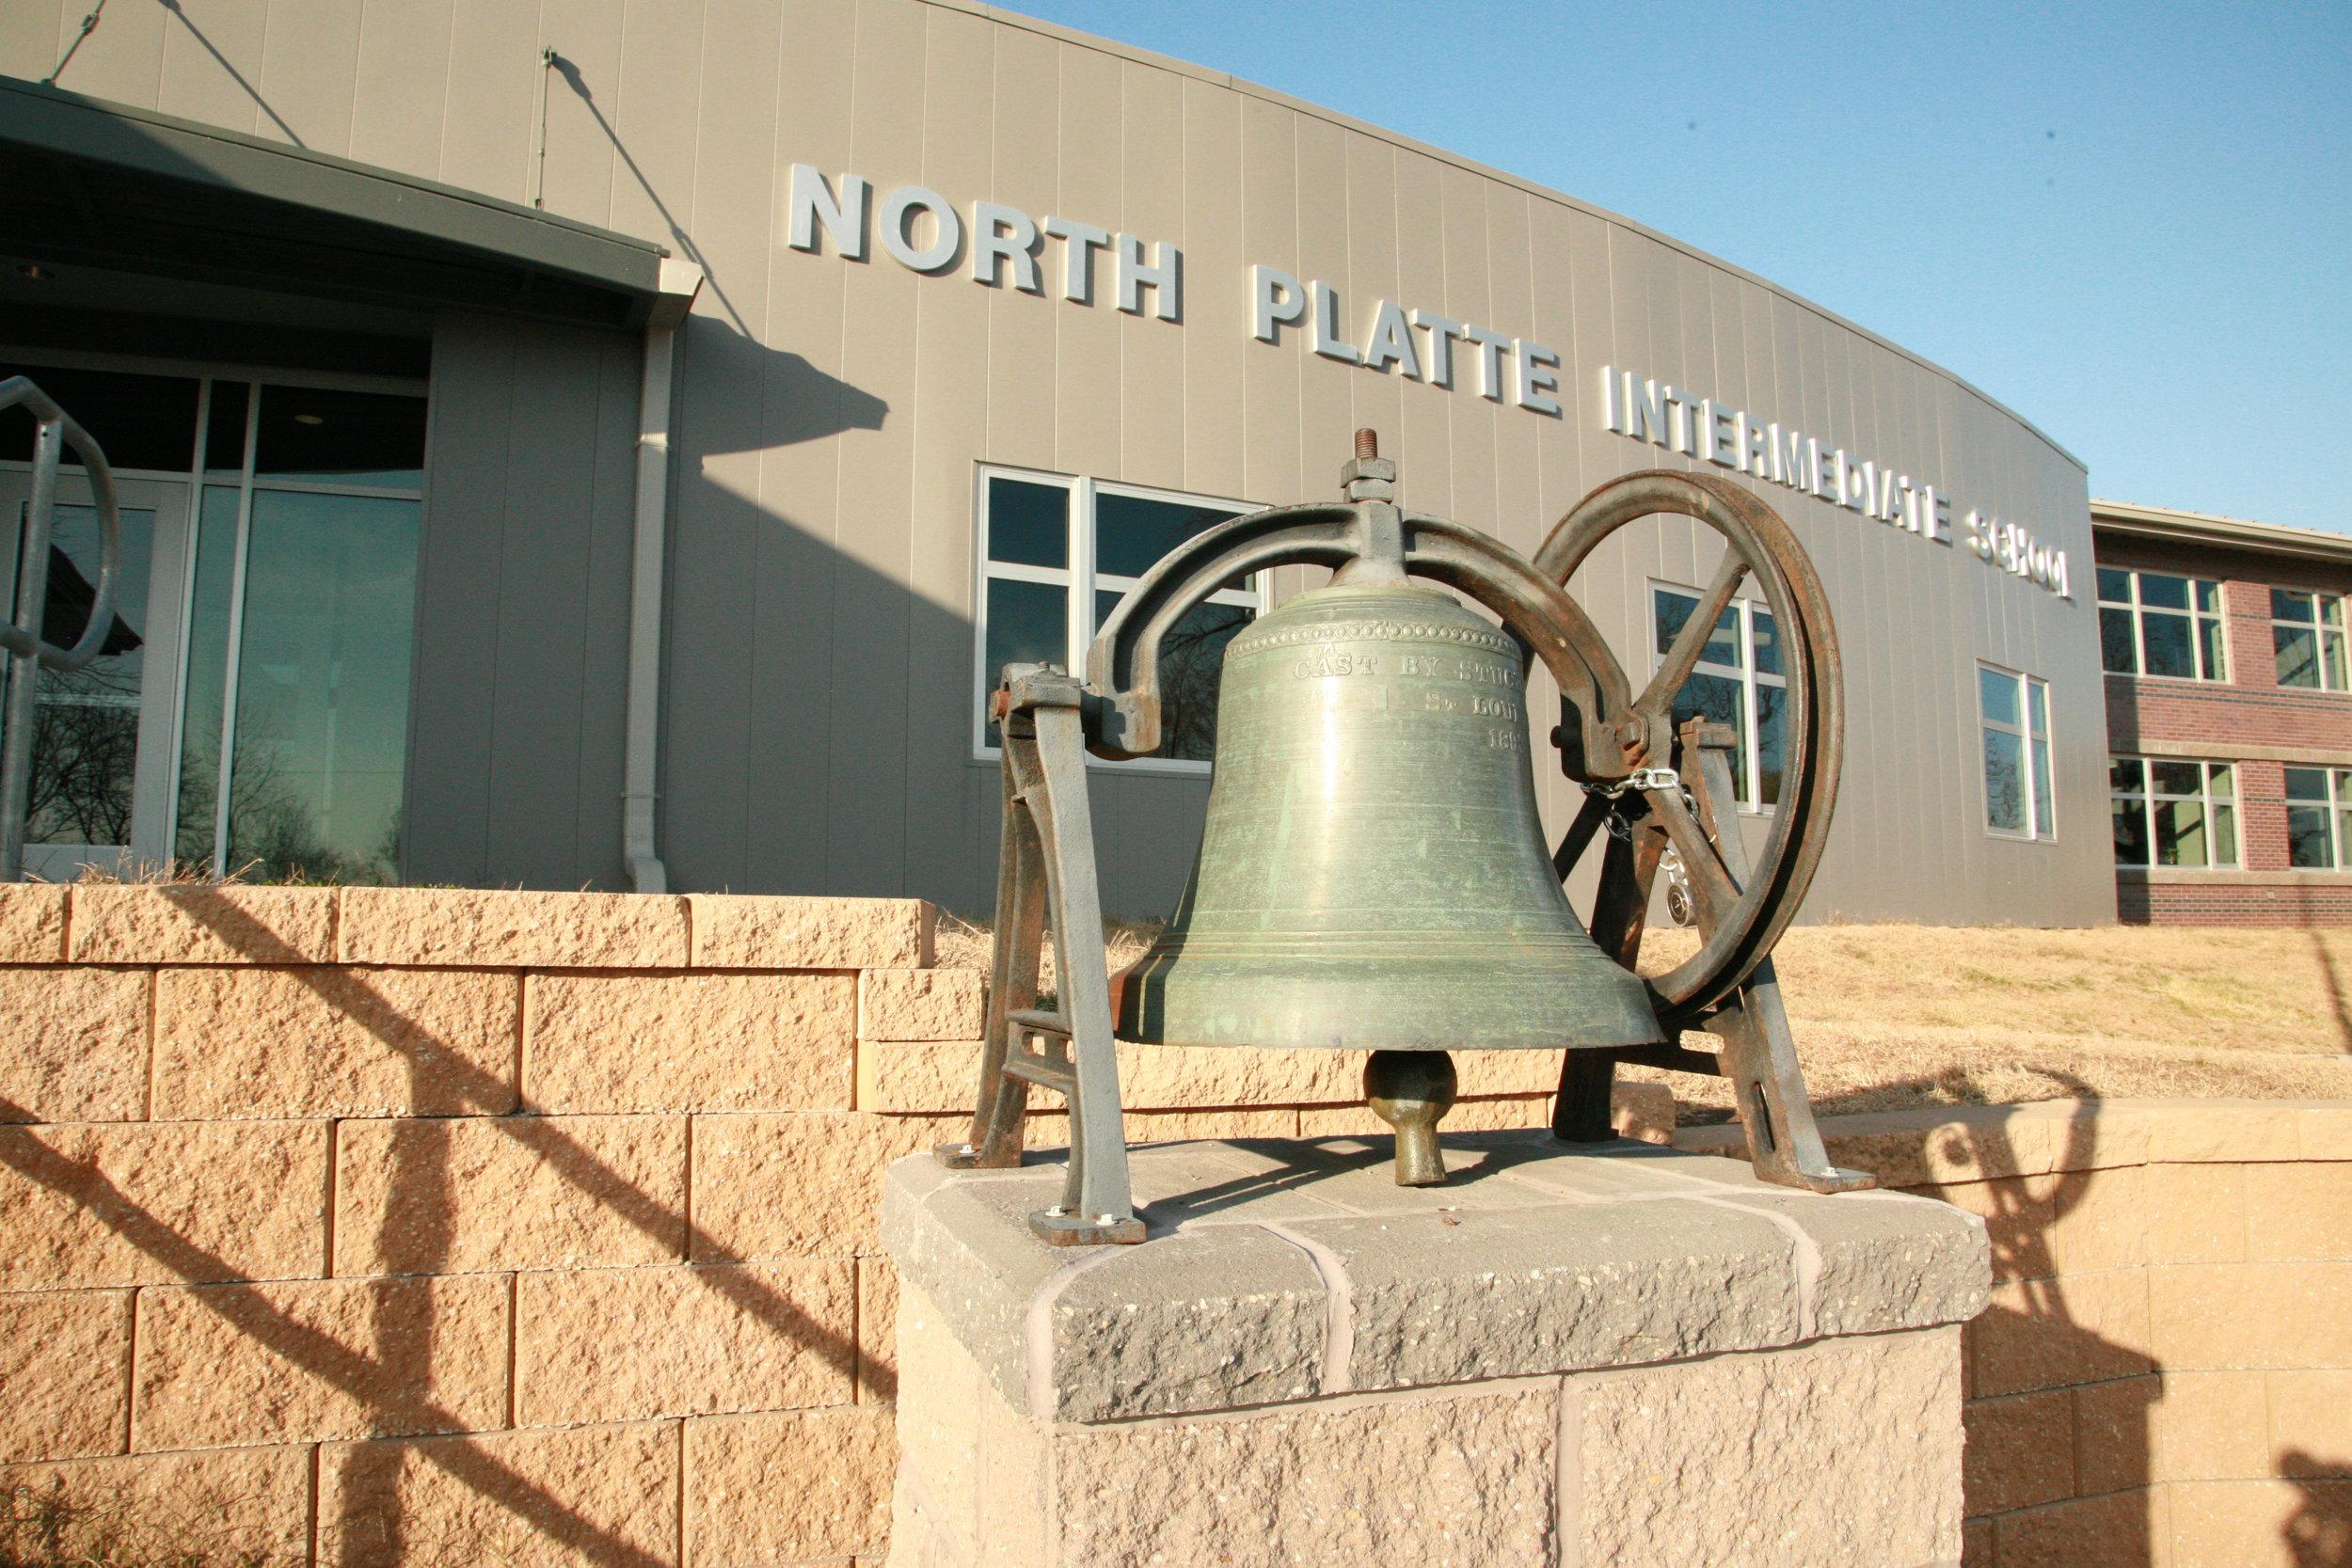 North Platte Intermediate School